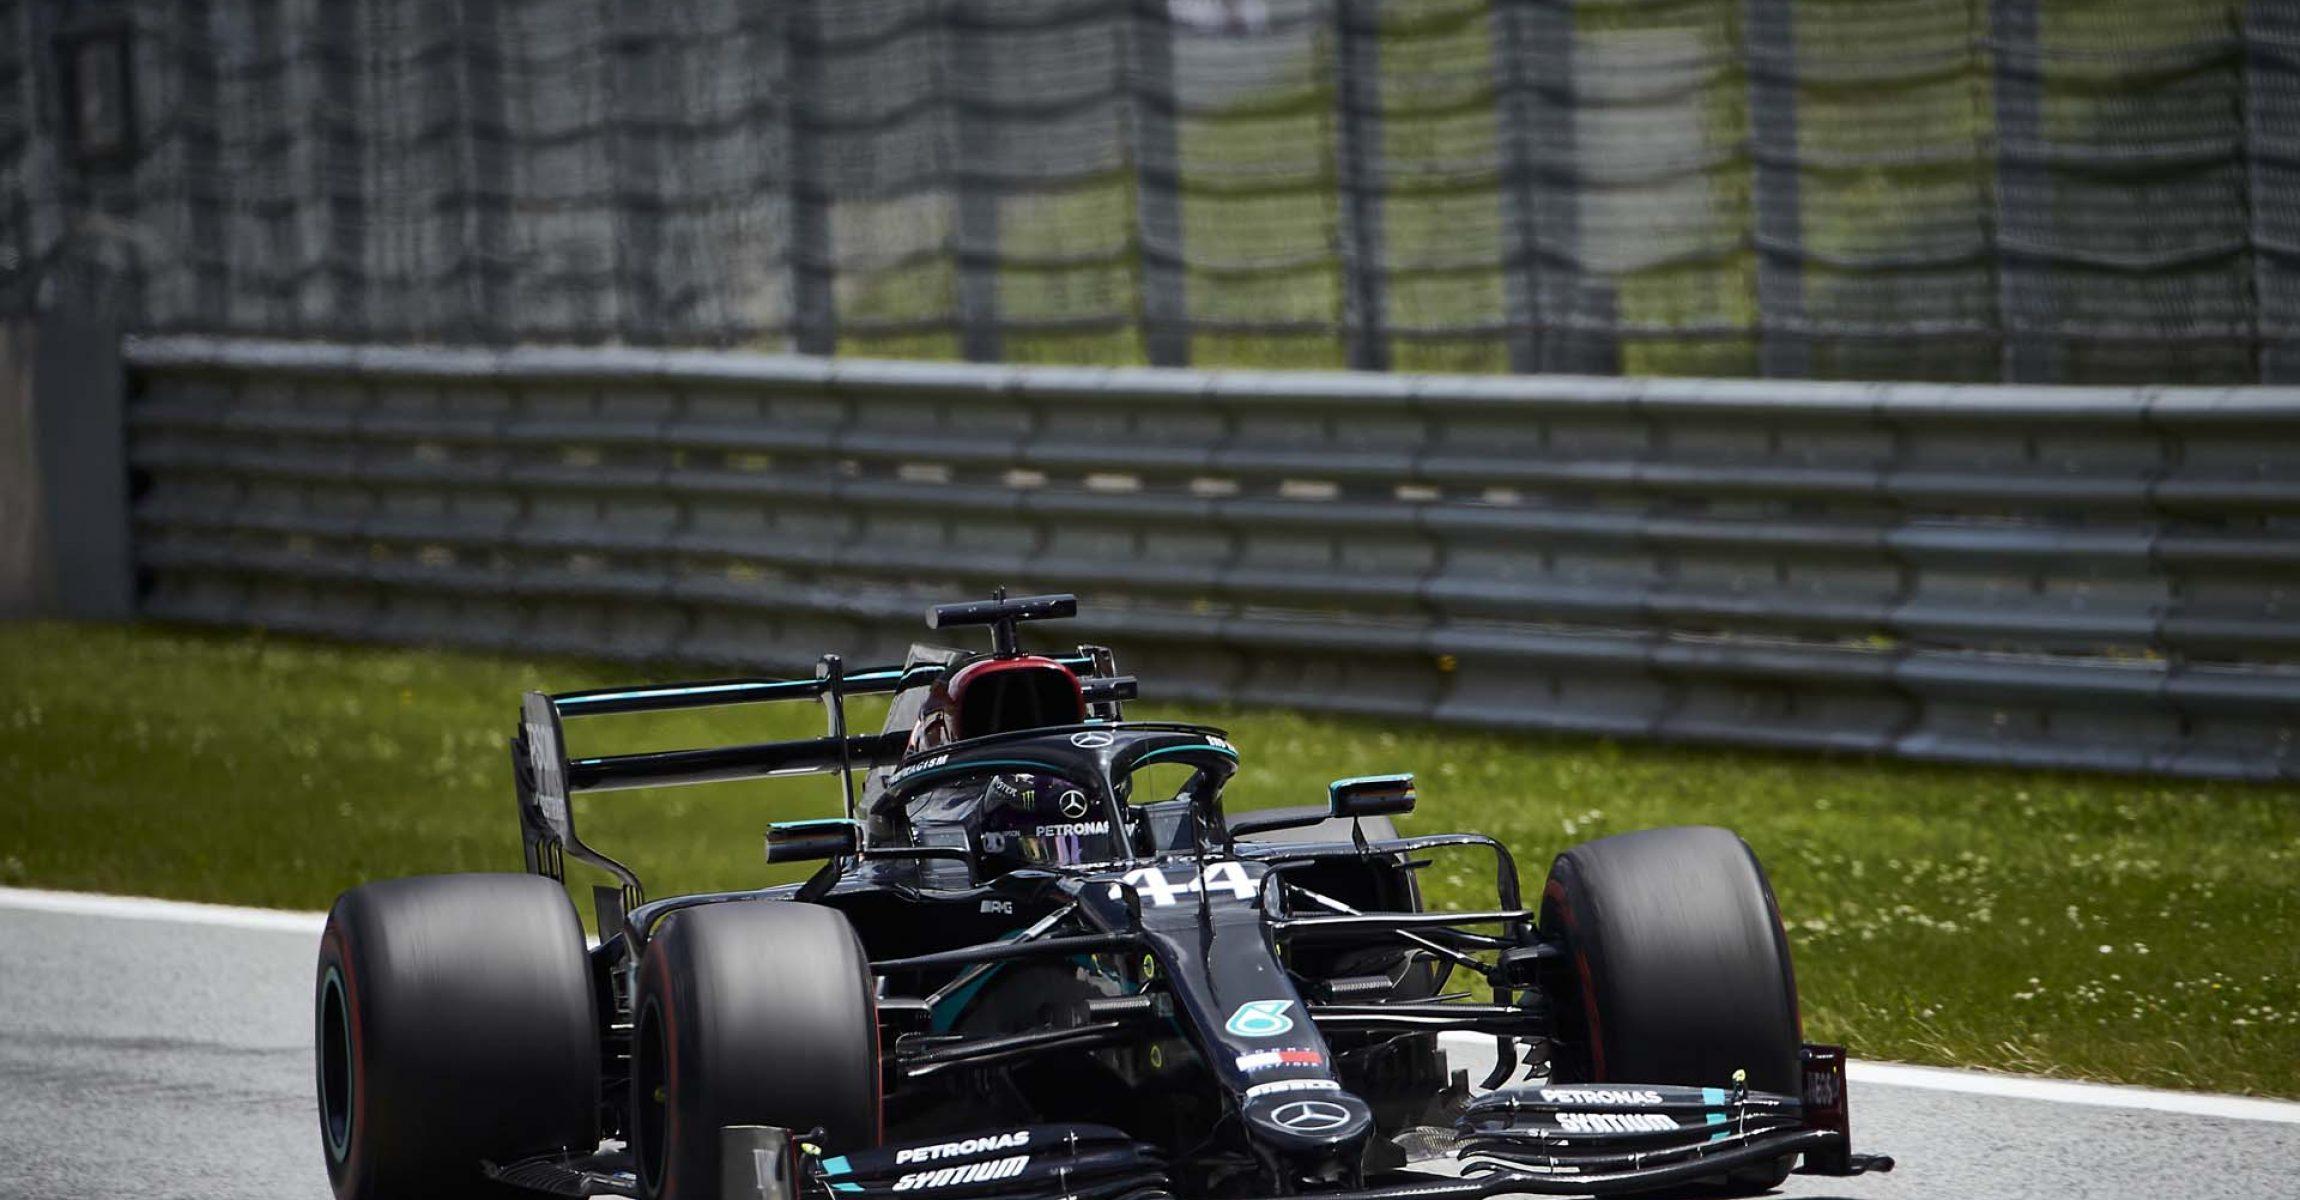 2020 Austrian Grand Prix, Saturday - Steve Etherington Lewis Hamilton Mercedes